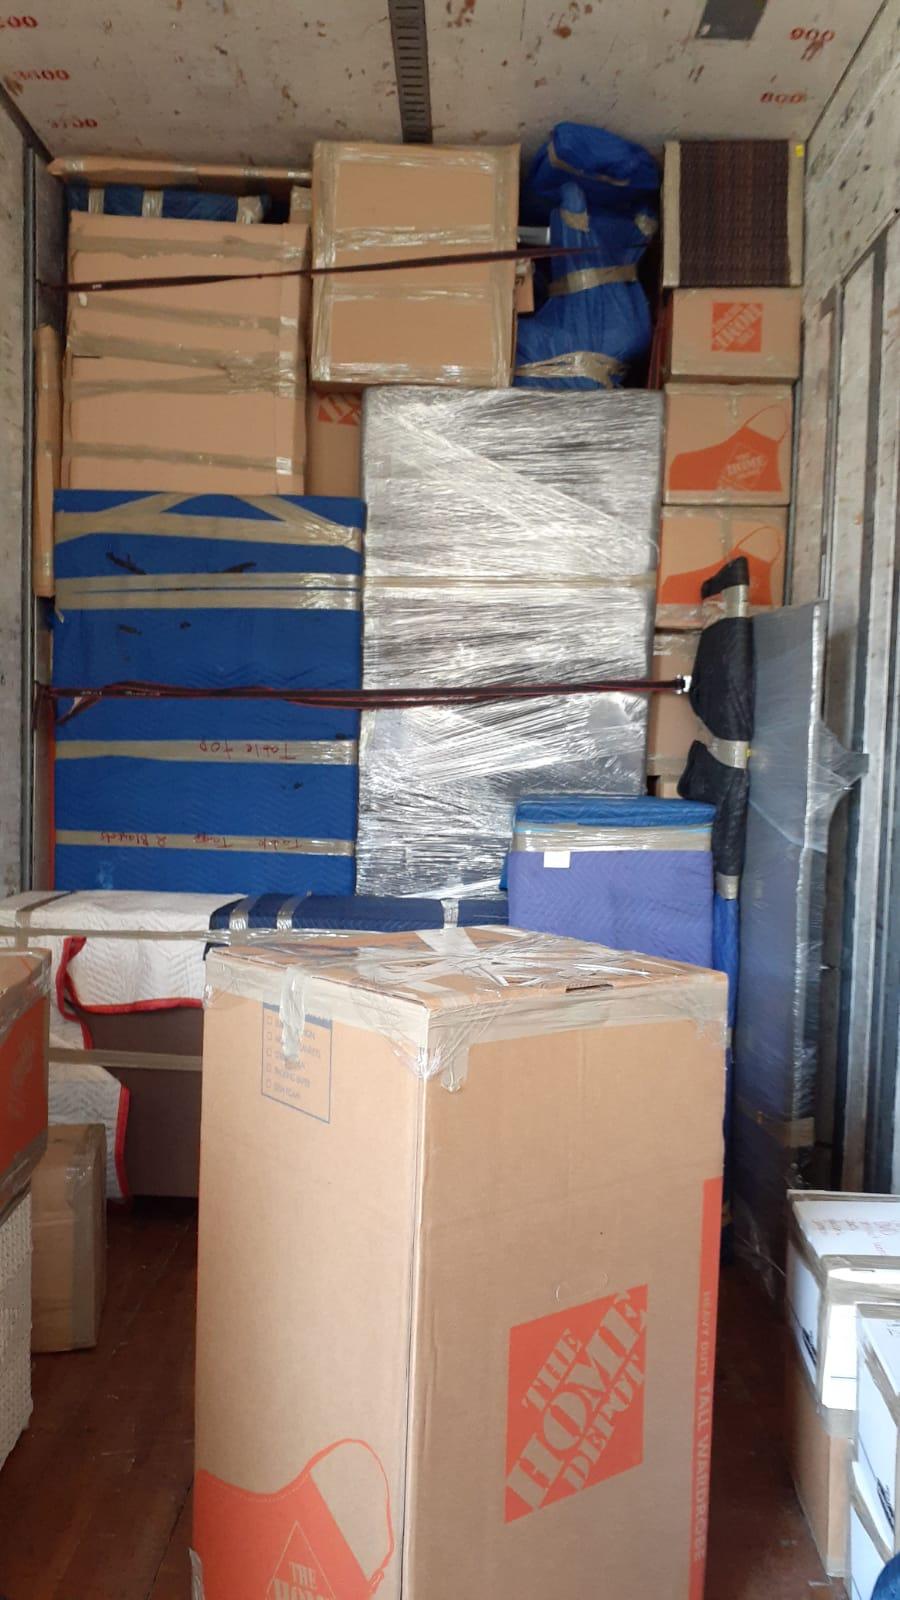 Jva Transportation Llc - moving company  | Photo 10 of 10 | Address: 133 Lester St, Angier, NC 27501, USA | Phone: (919) 400-3890